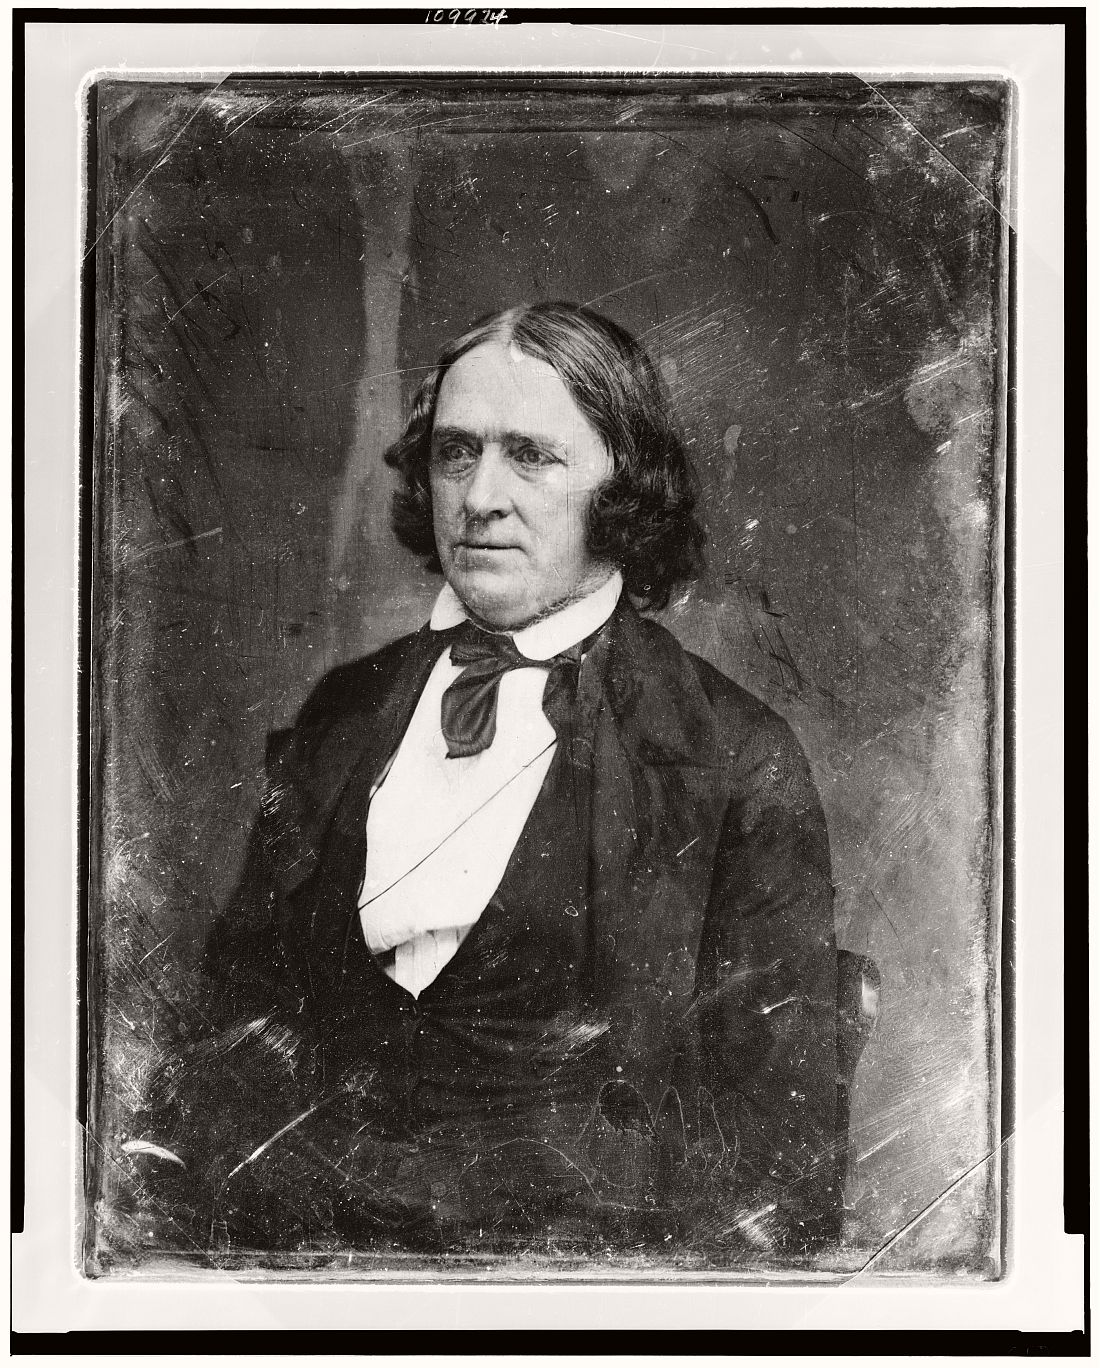 vintage-daguerreotype-portraits-from-xix-century-1844-1860-24